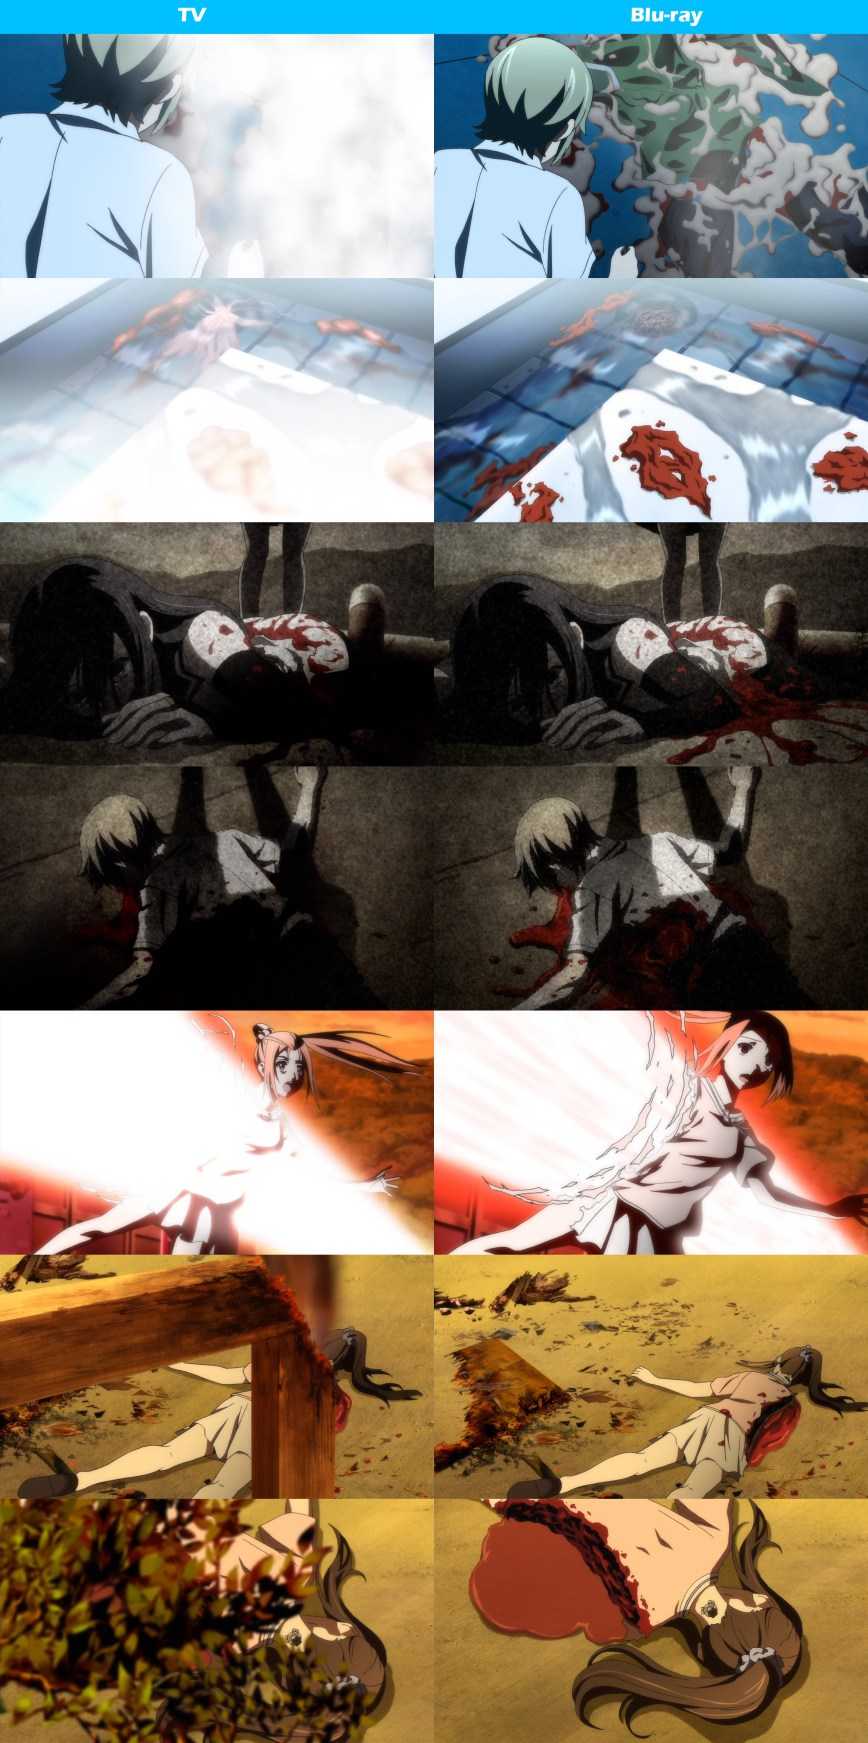 Gokukoku-no-Brynhildr-TV-and-Blu-ray-Comparisons-Gore-3